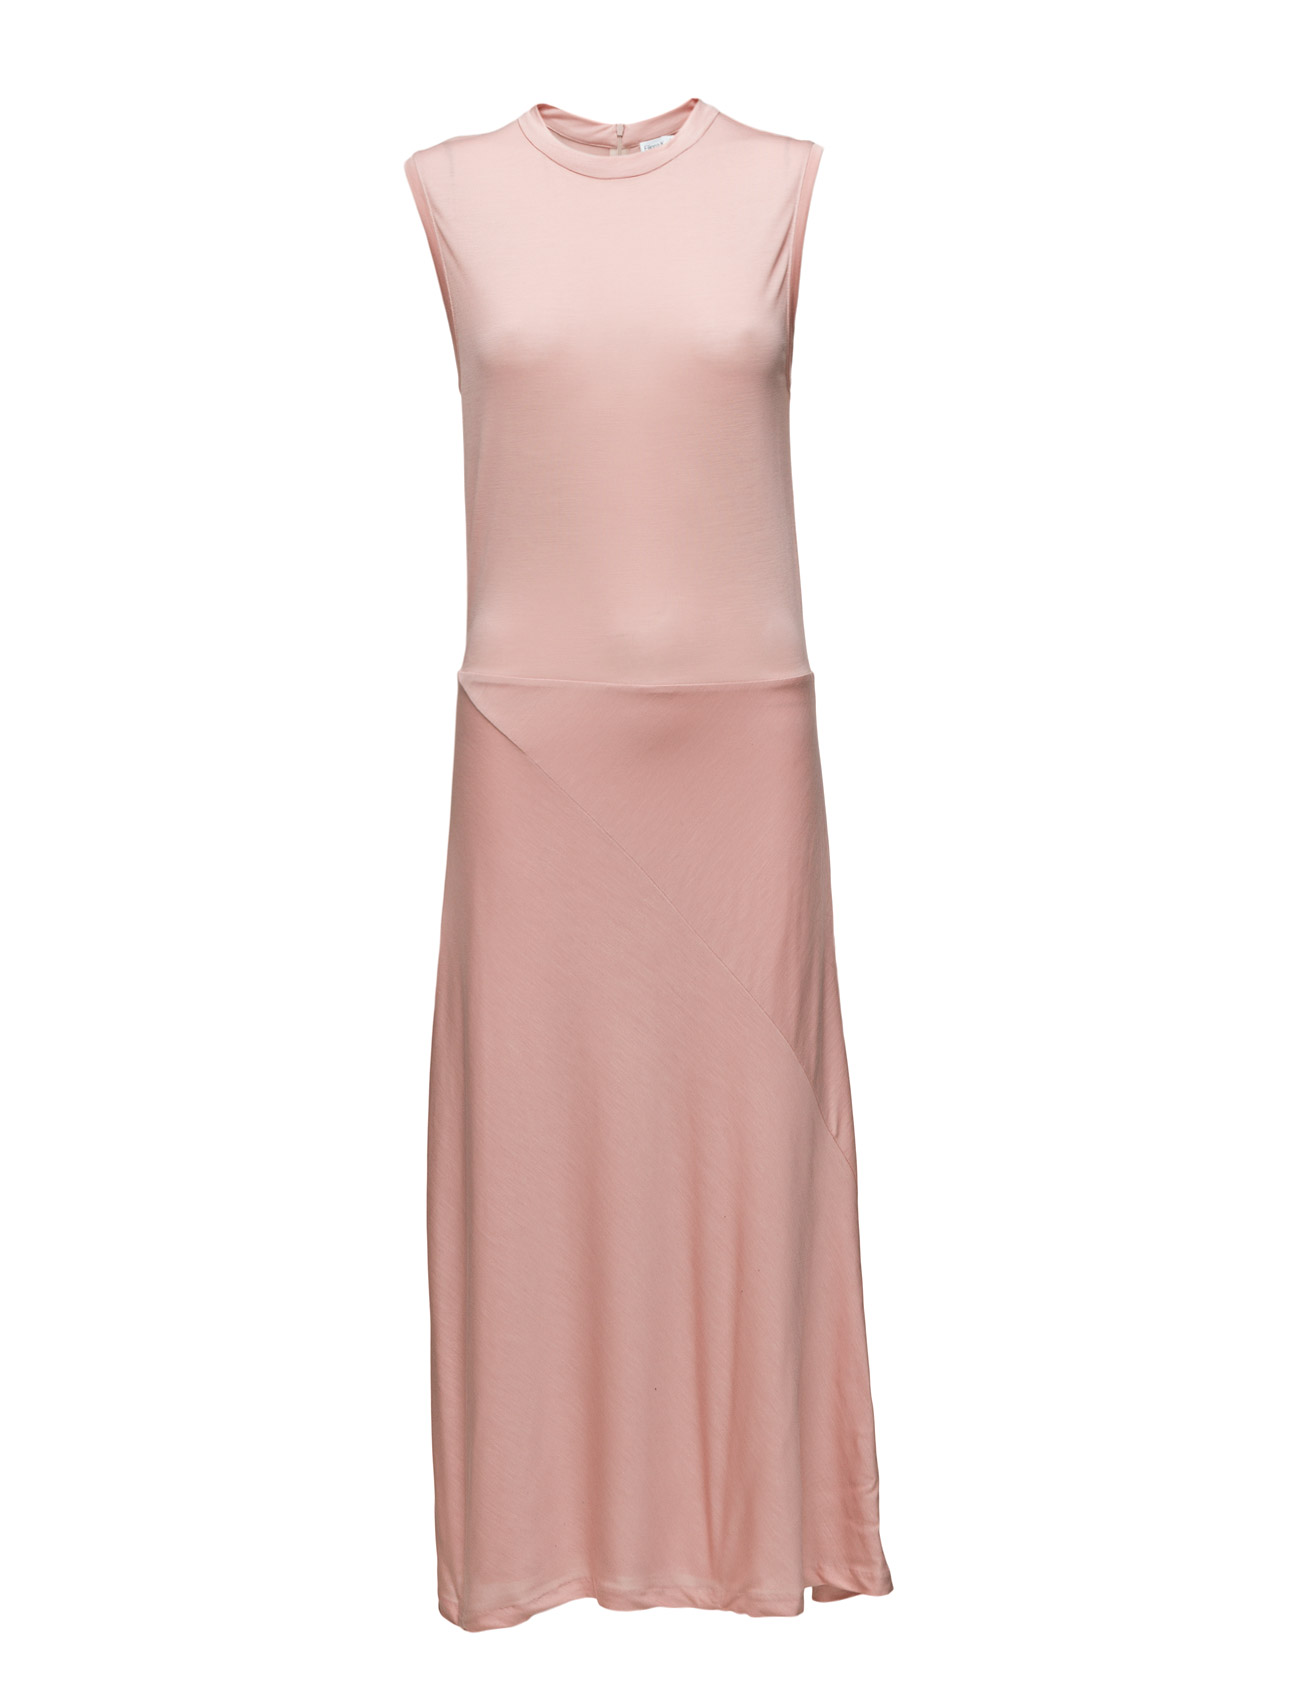 Bias Jersey Dress Filippa K Maxi Kjoler til Kvinder i